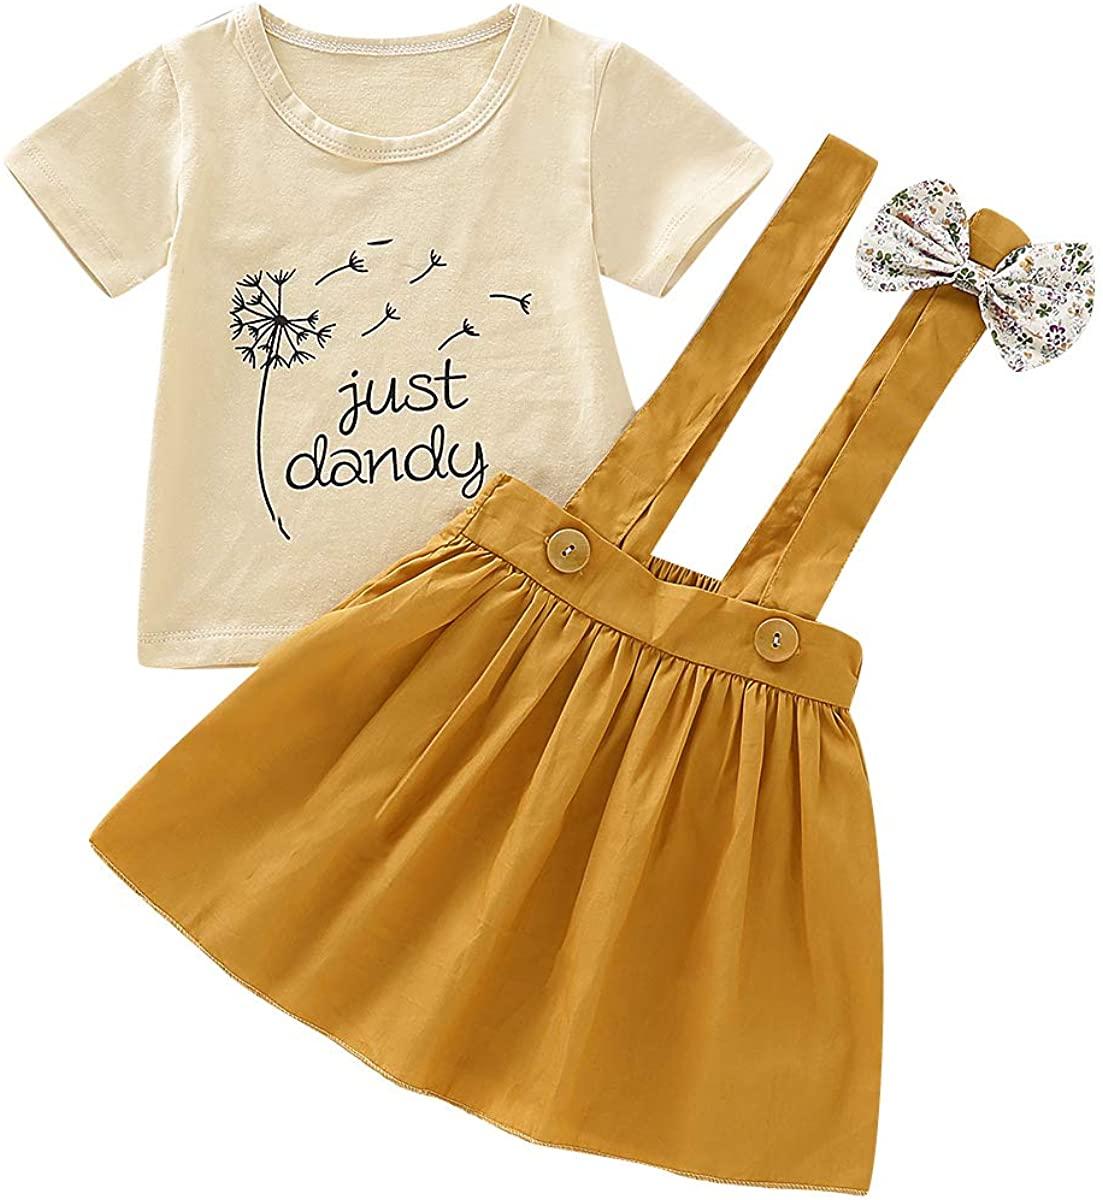 DaMohony Kids Baby Girl Skirt Outfits Short Sleeve Tops + Suspender Skirt Summer Clothes